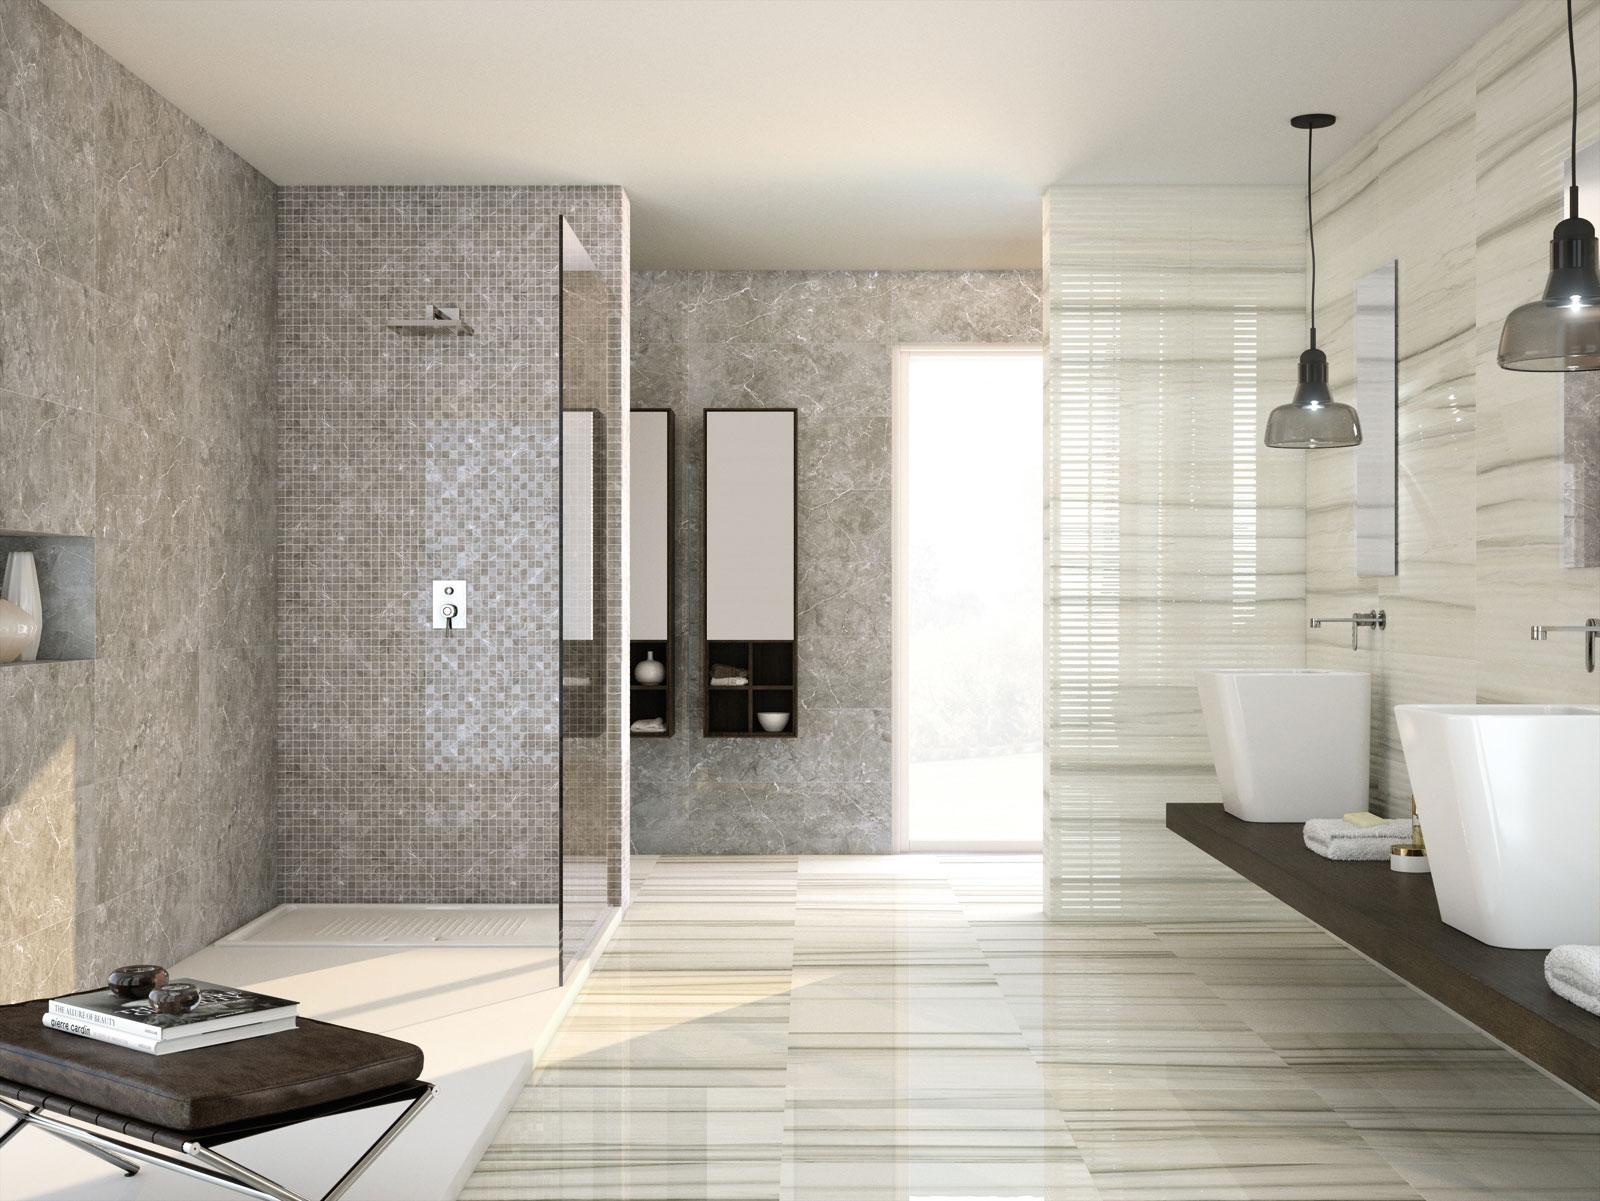 fliesen in marmoroptik kaufen. Black Bedroom Furniture Sets. Home Design Ideas